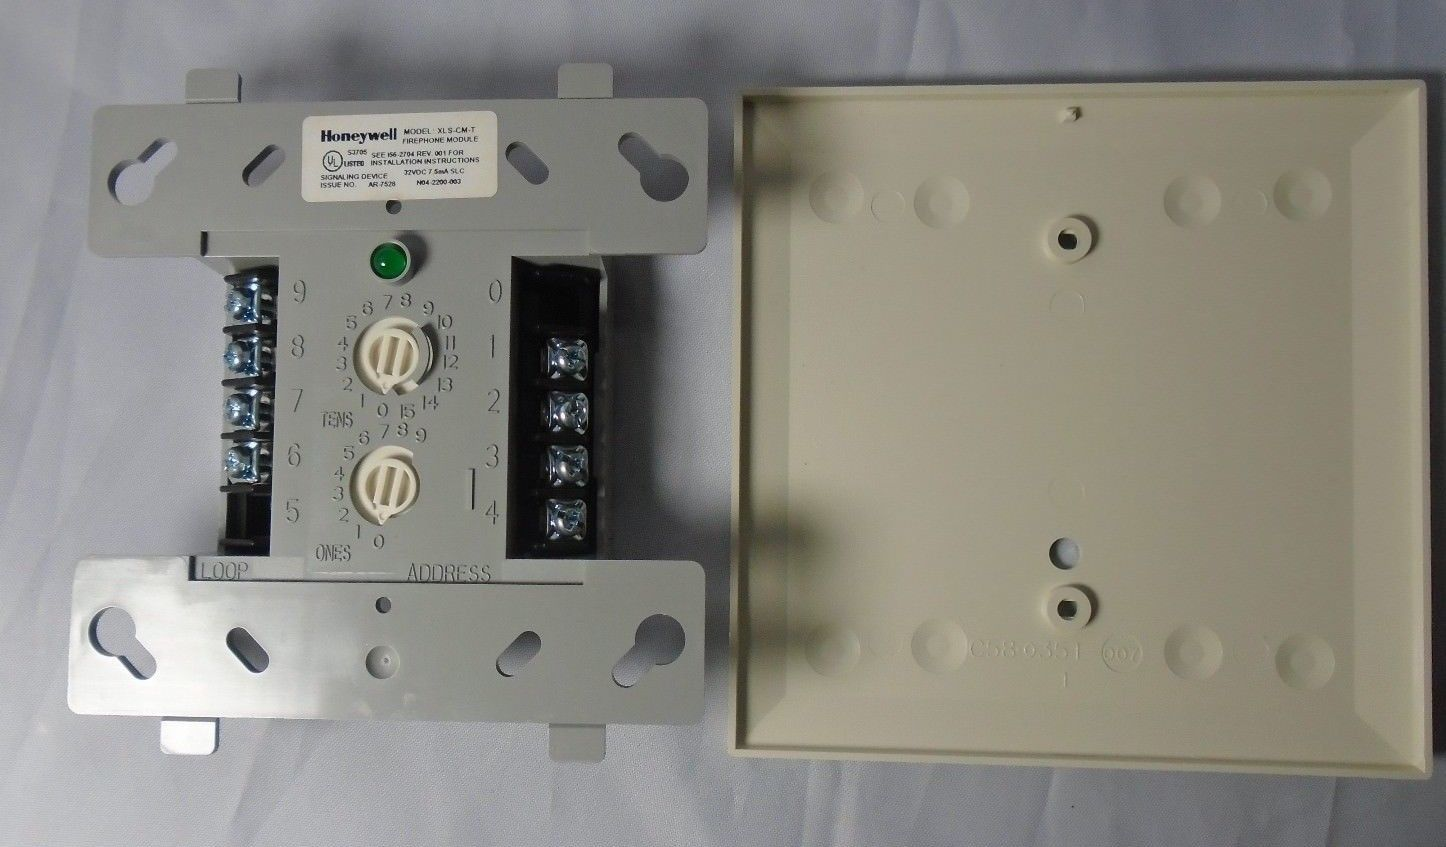 honeywell xls cm t fire alarm firephone and 50 similar items rh bonanza com Honeywell Ademco 6150 User Manual Honeywell Alarm Keypad Beeping